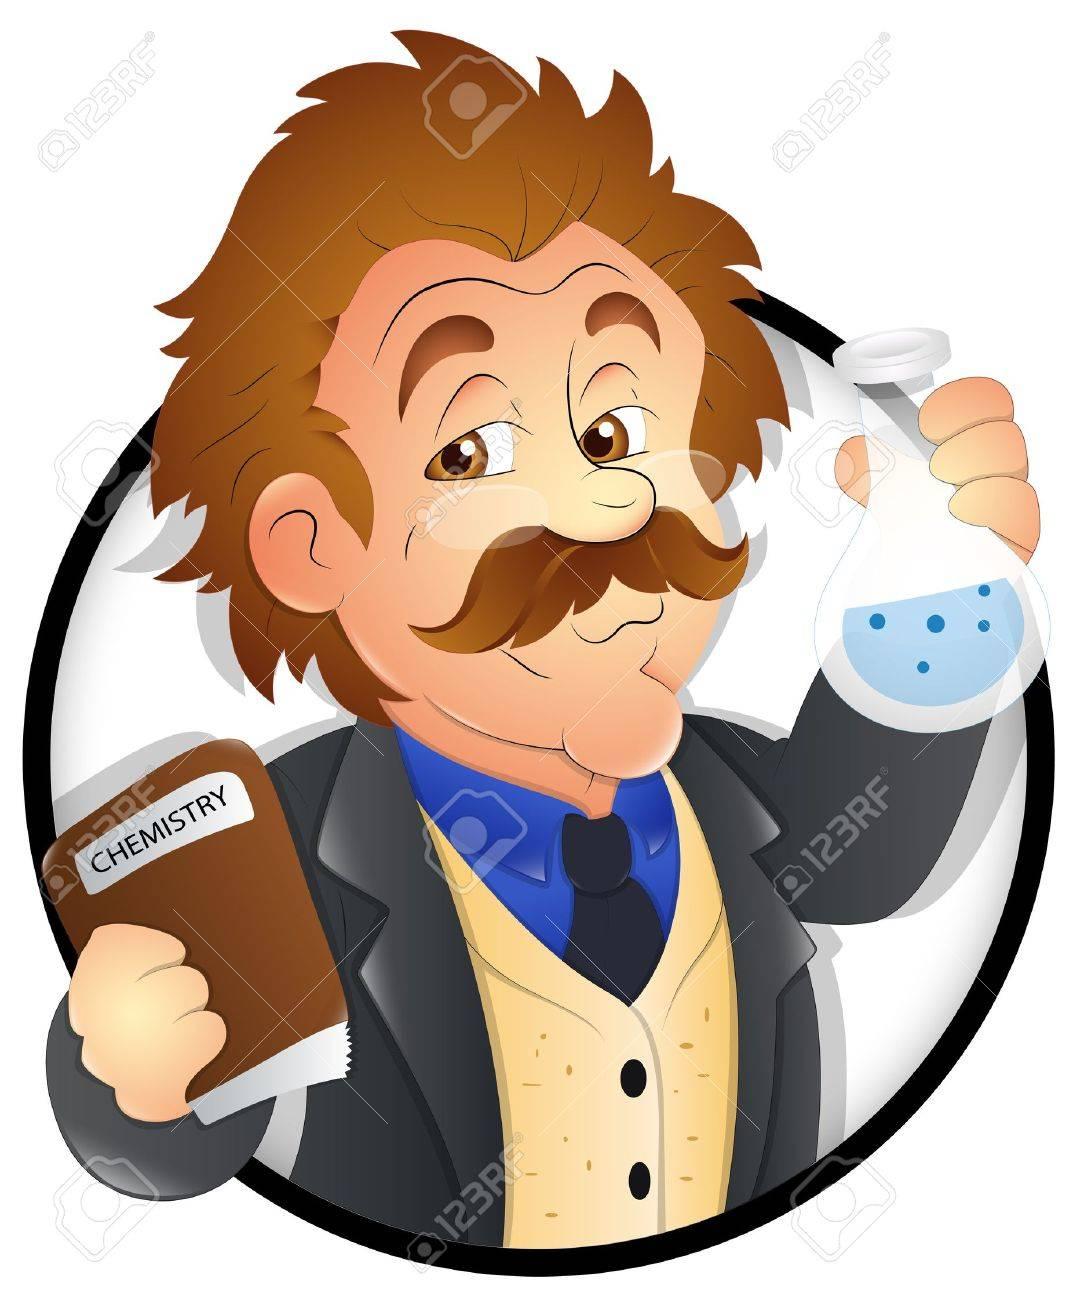 Scientist -  Character Illustration Stock Vector - 16775664